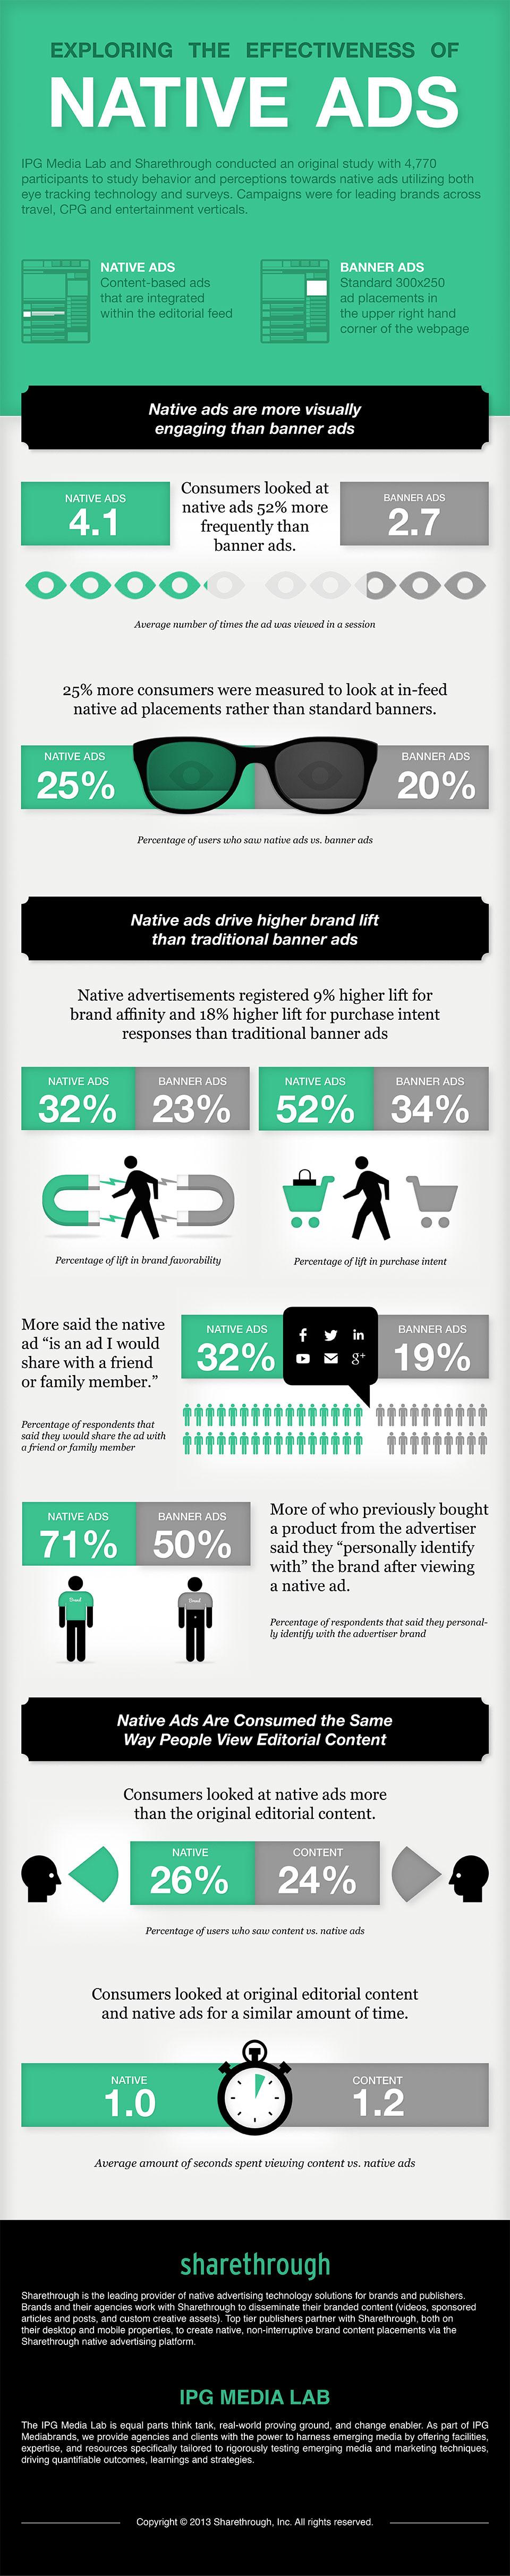 sharethrough-IPG-Infographic-web2